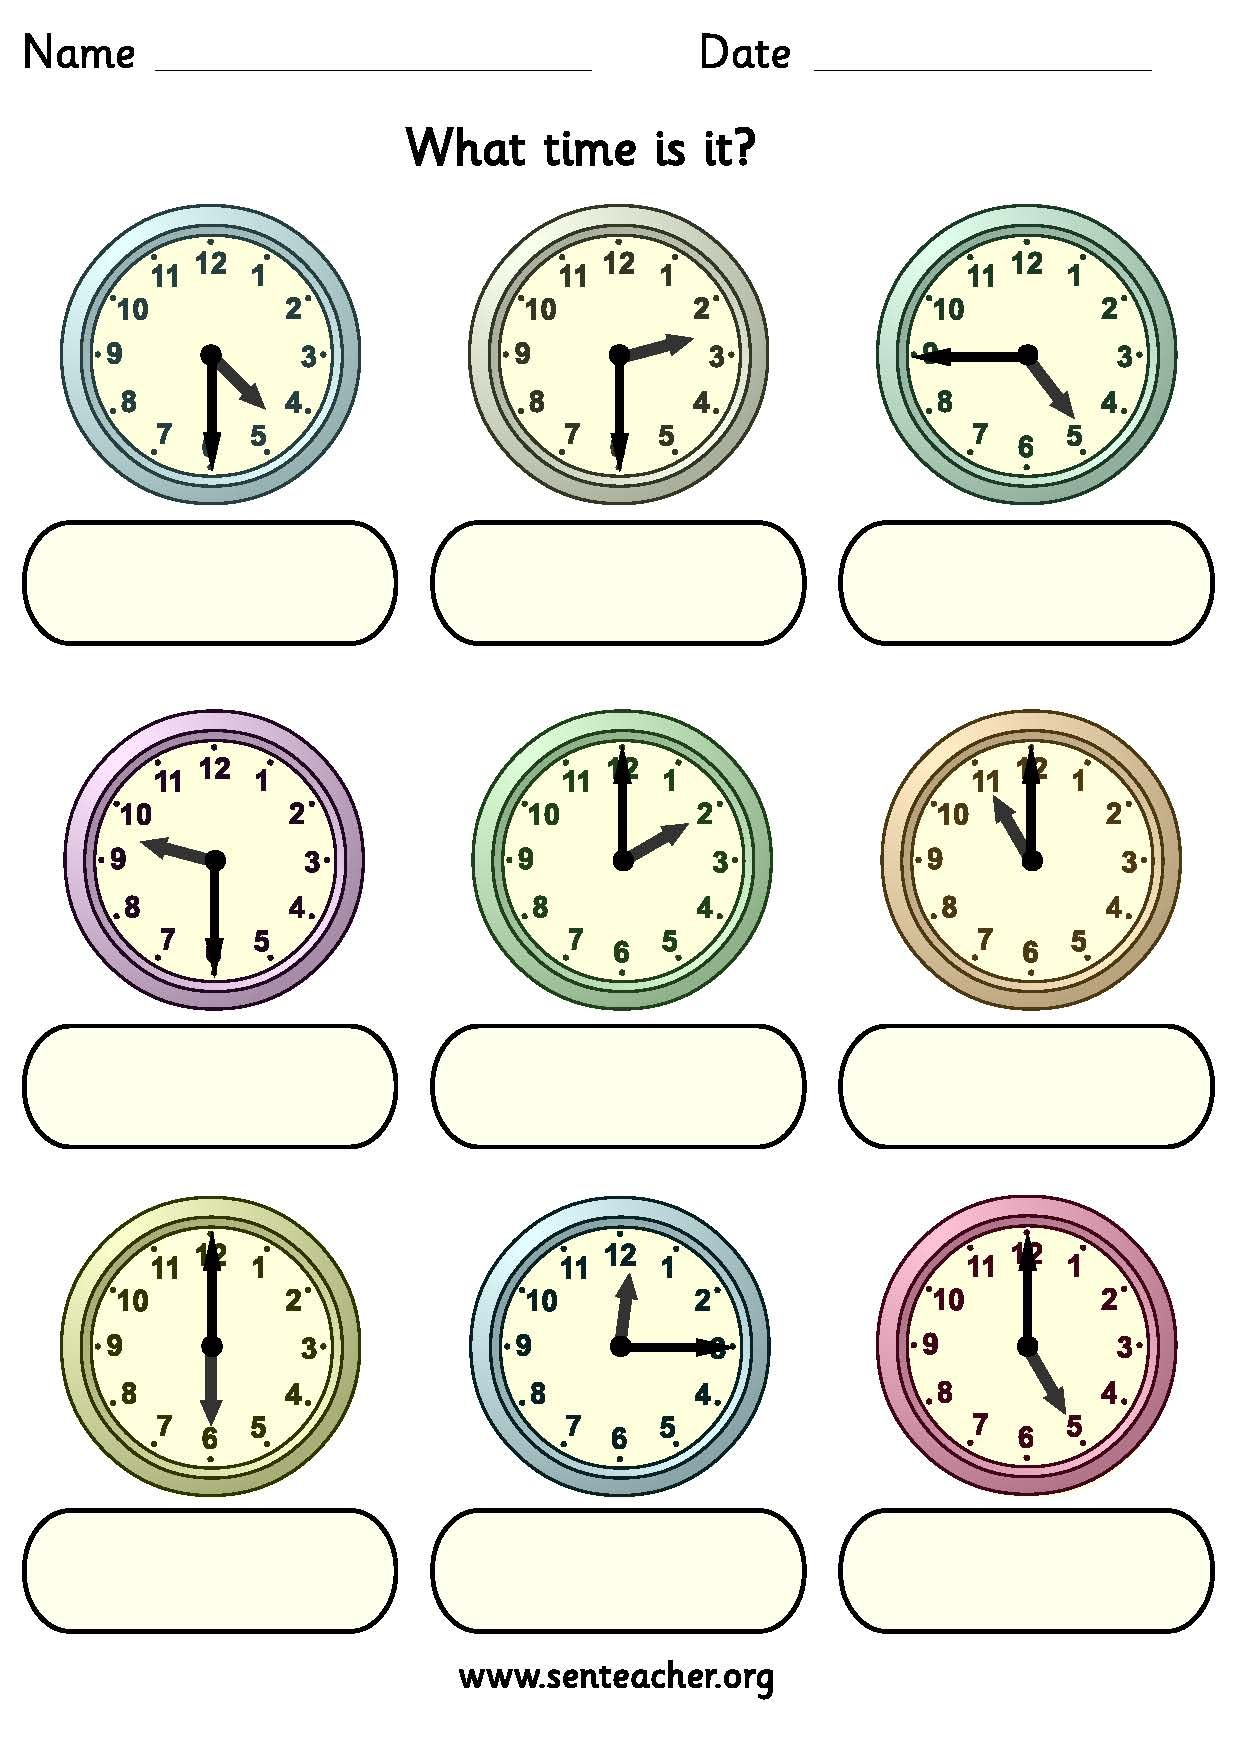 Worksheet Containing 9ogue Clocks Showing O Clock